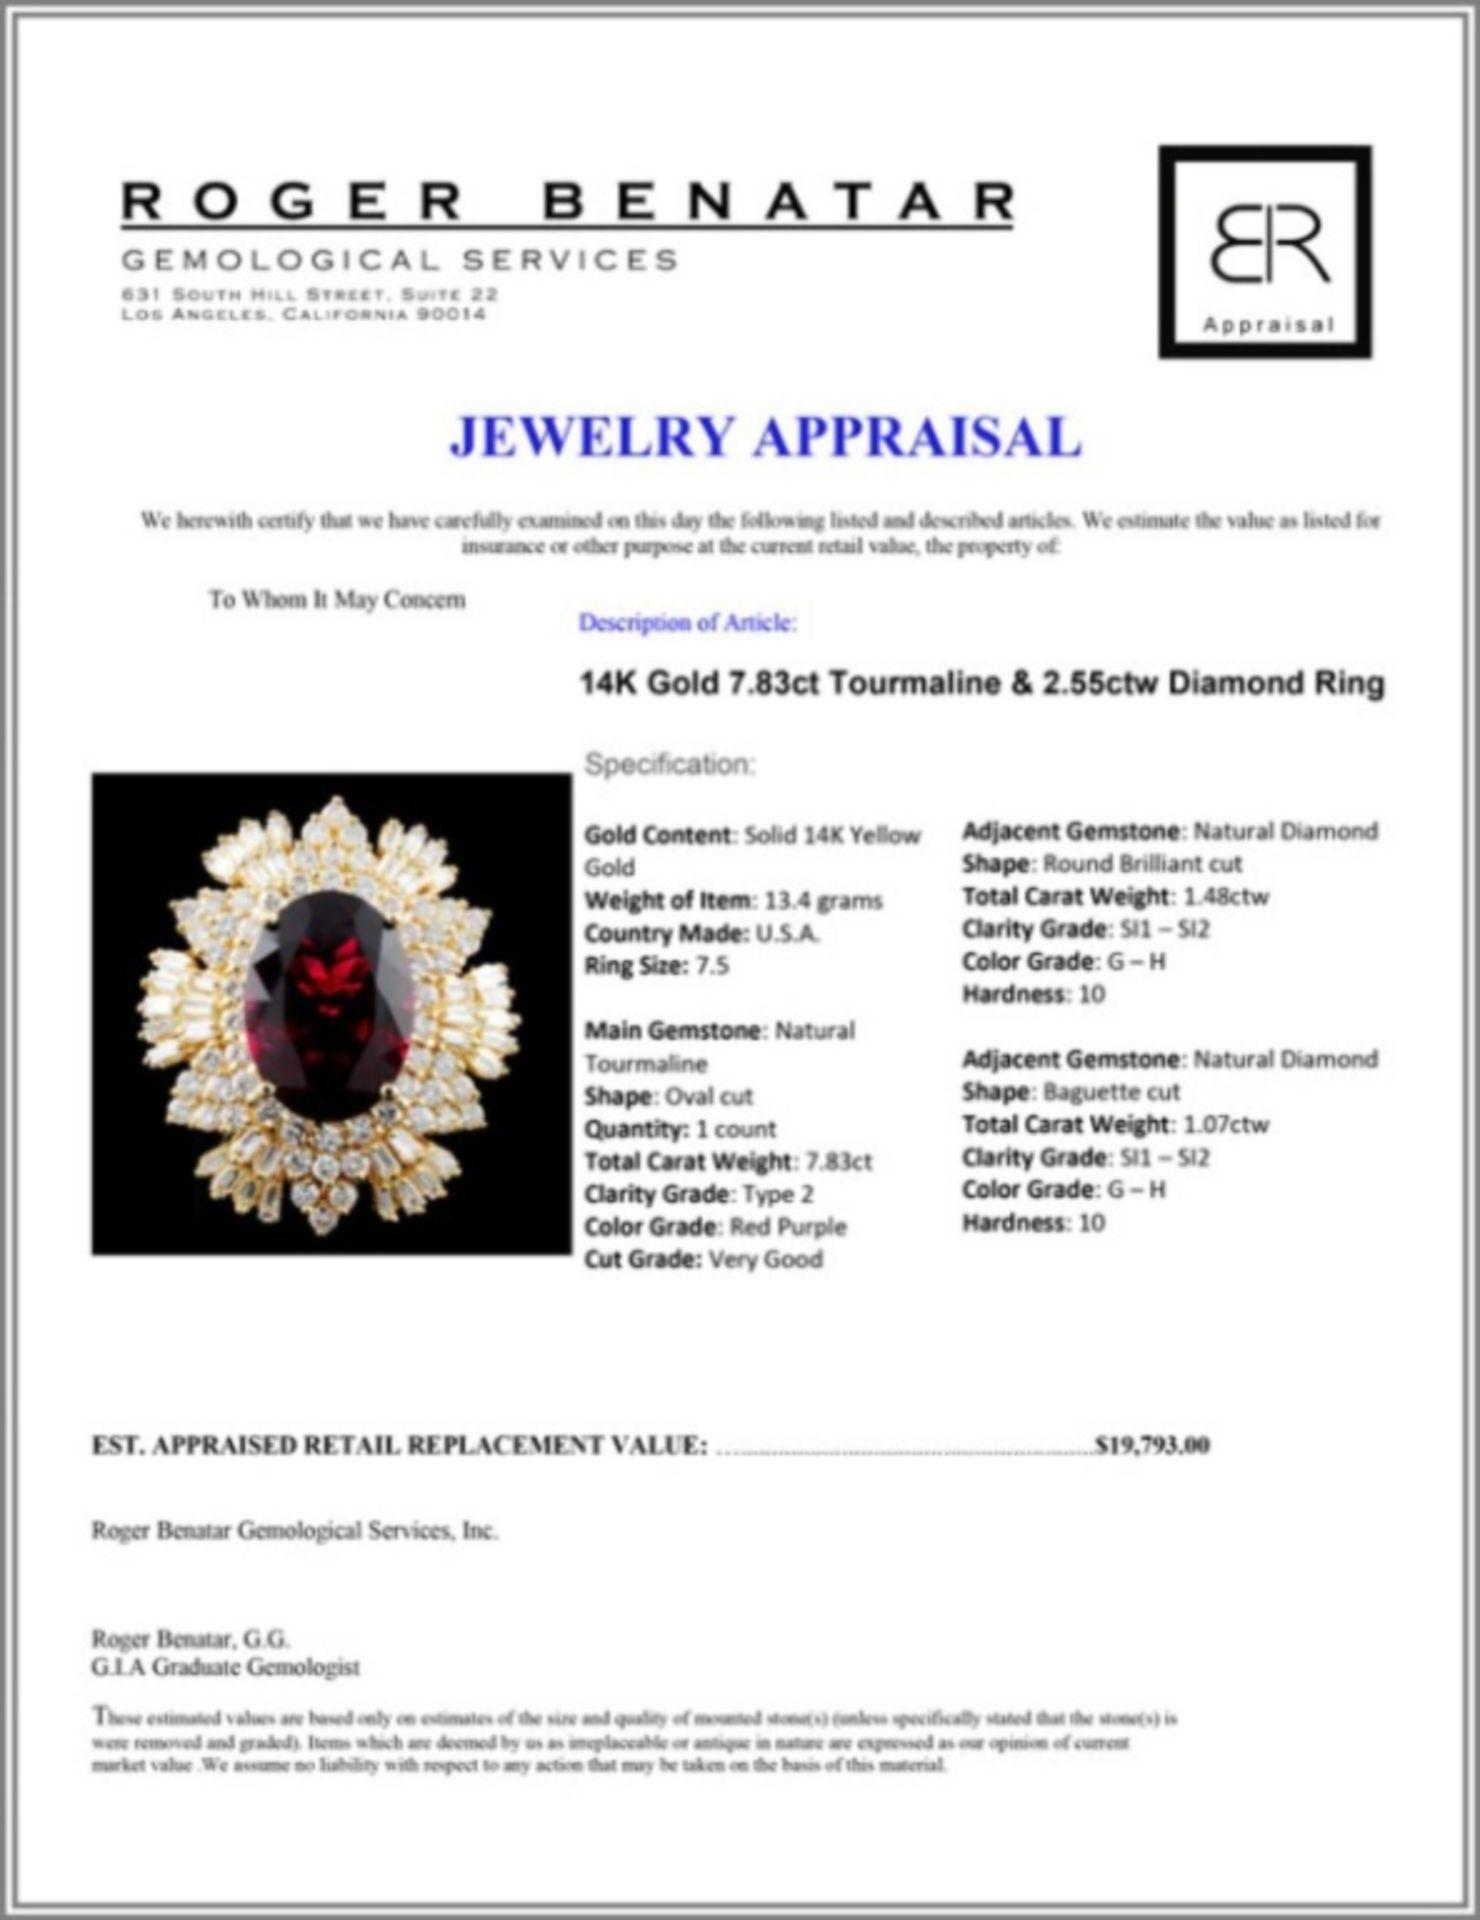 14K Gold 7.83ct Tourmaline & 2.55ctw Diamond Ring - Image 4 of 4